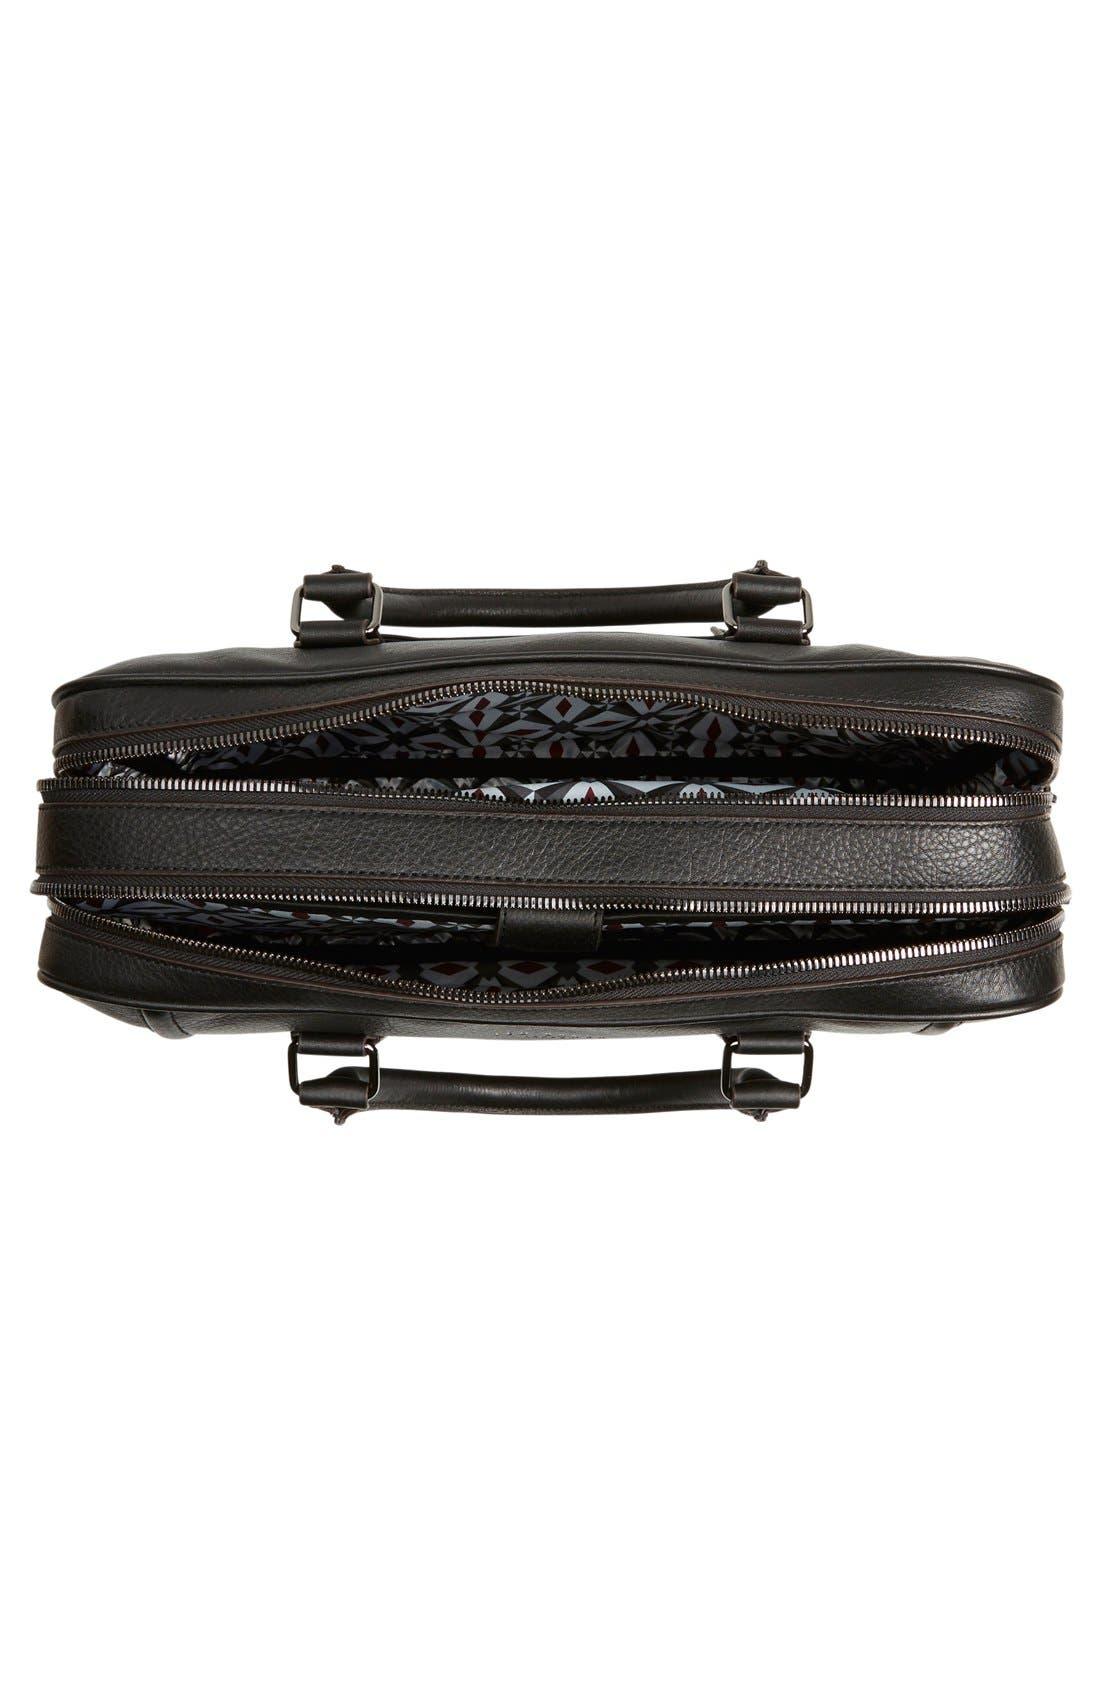 'Ragna' Leather Bowler Bag,                             Alternate thumbnail 4, color,                             001